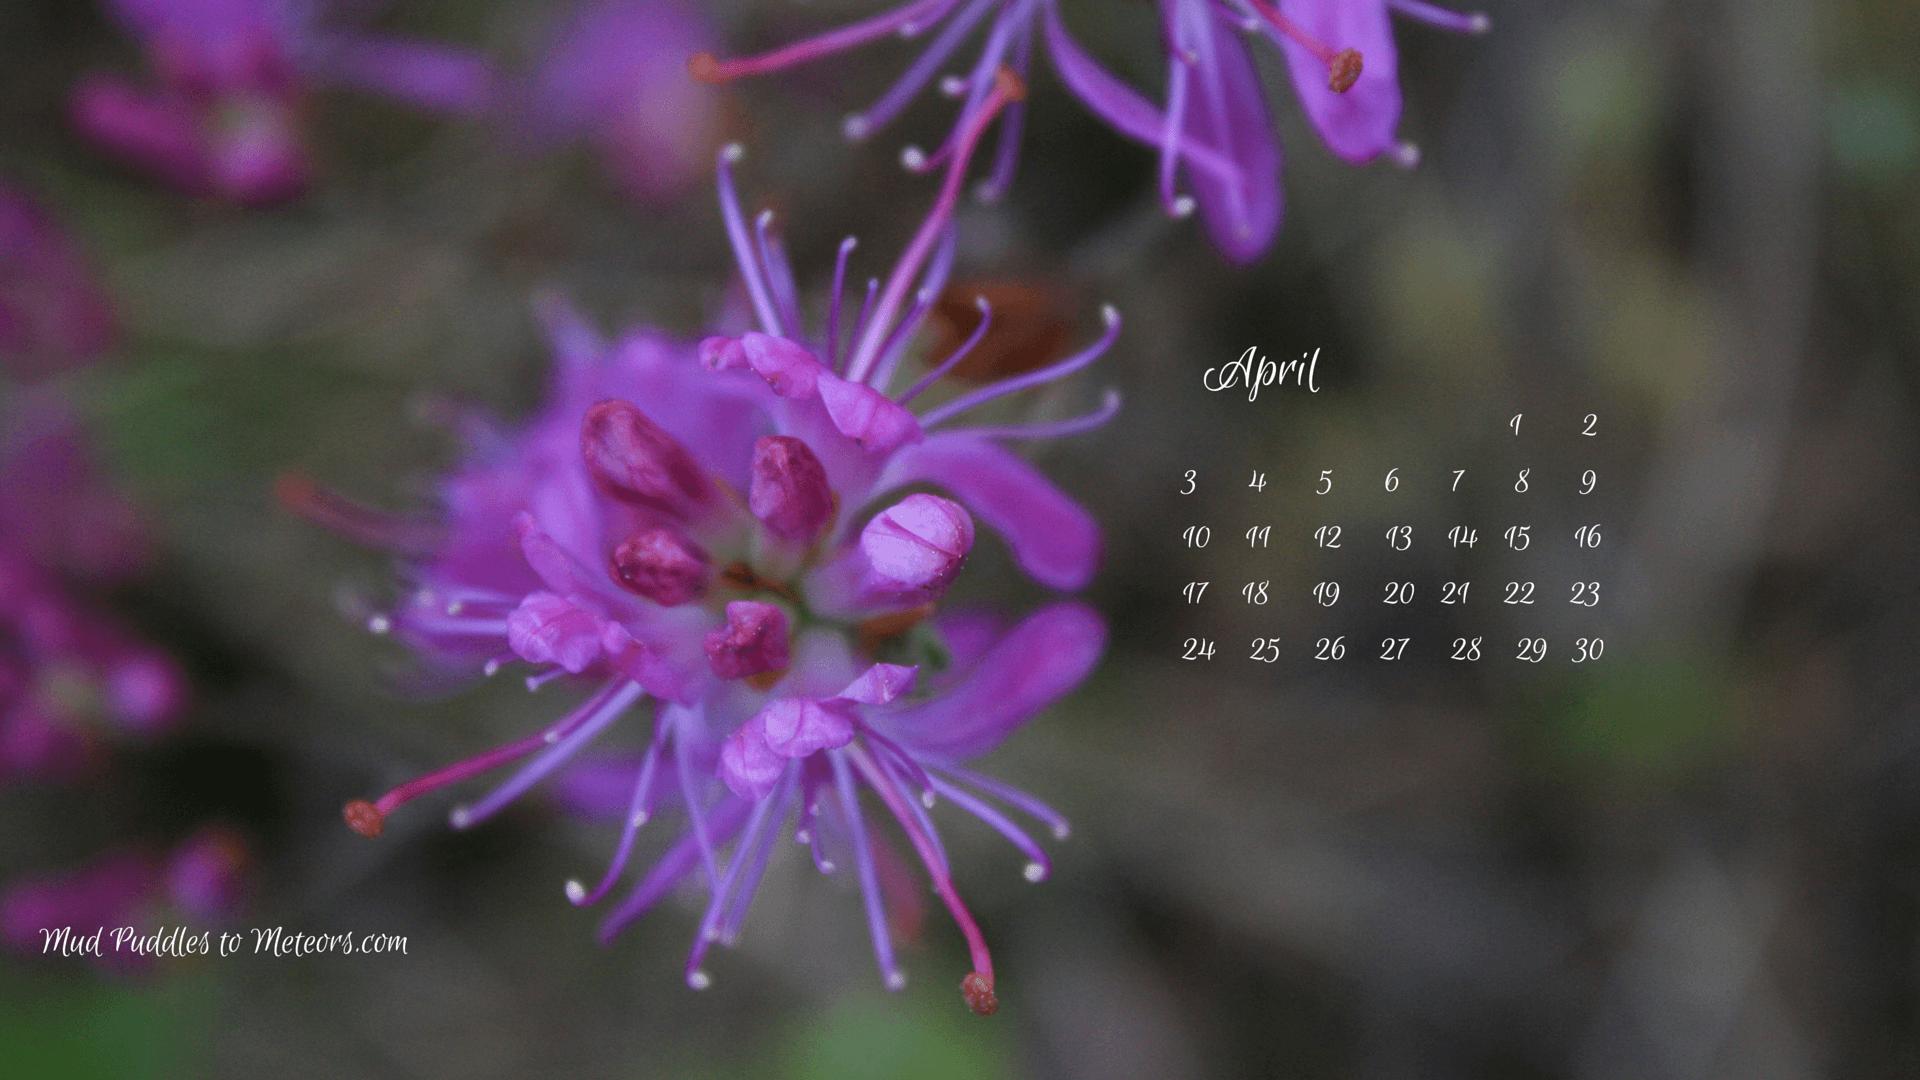 Desktop Calendar April 2016 perfect desktop calendar april 2016 poppy wallpaper 8 comments add